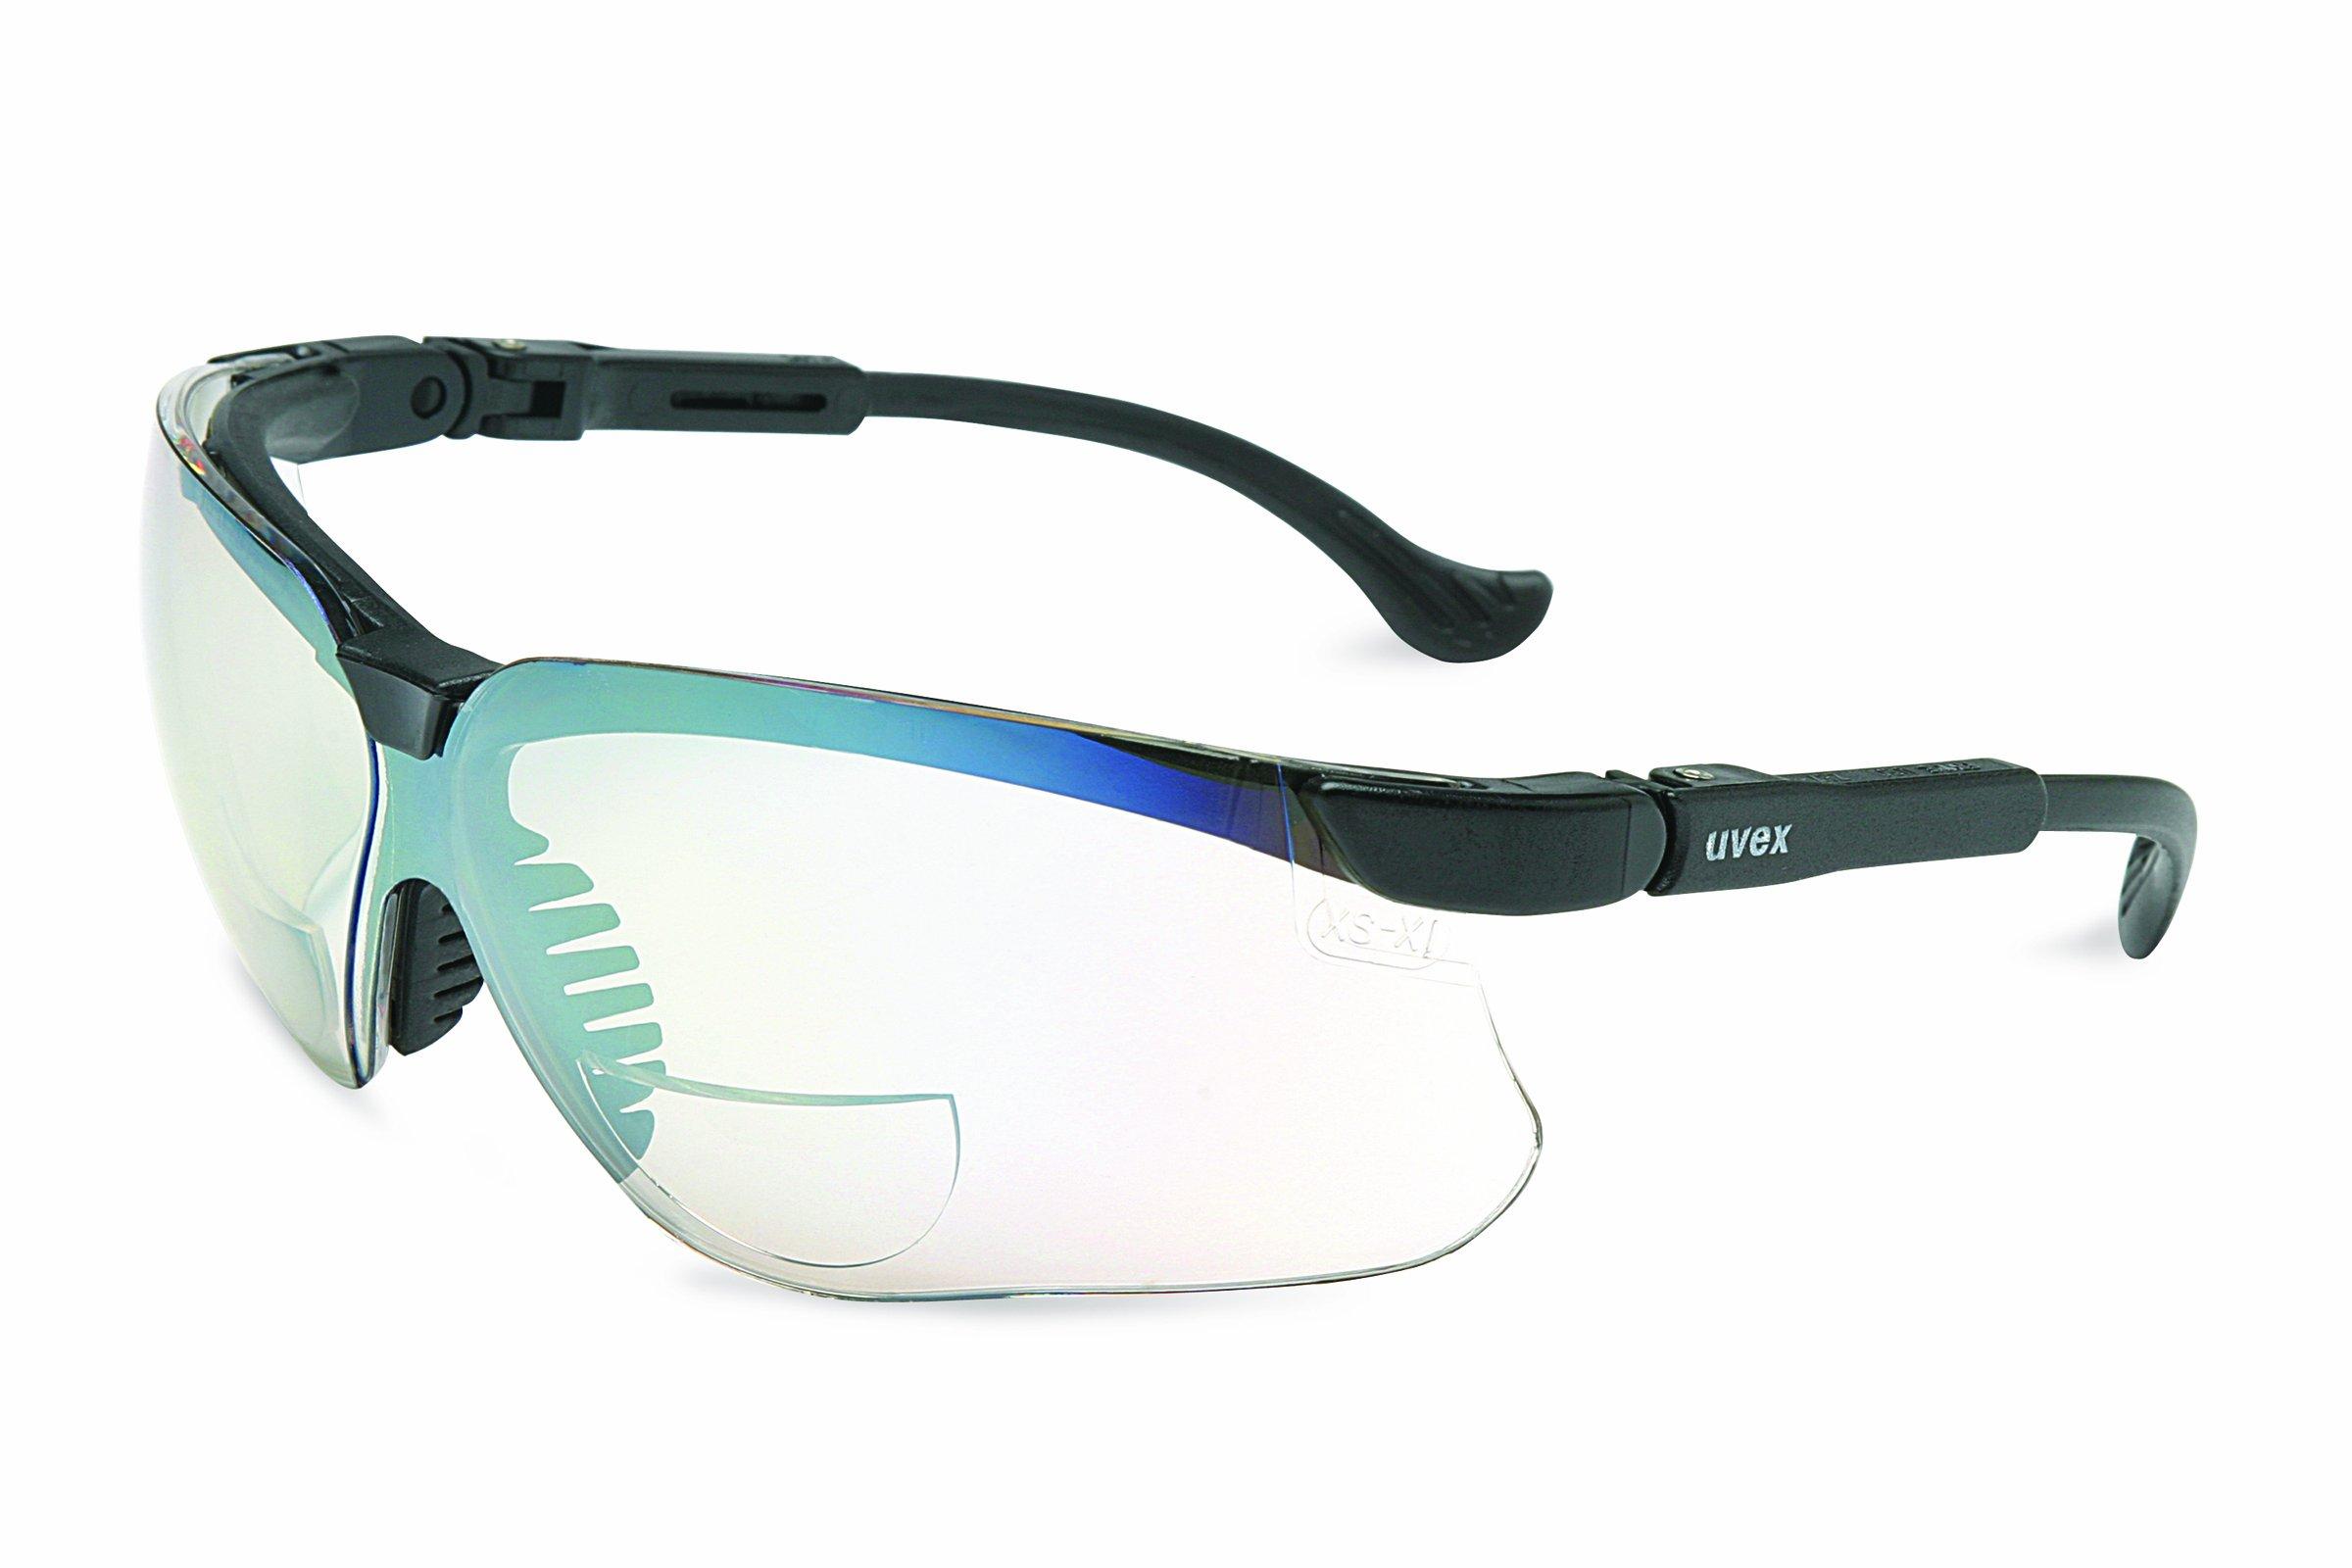 Uvex S3778 Genesis Reading Magnifiers Safety Eyewear +2-1/2, SCT-Reflect 50 Frame, Standard Gray Ultra-Dura Hardcoat Lens